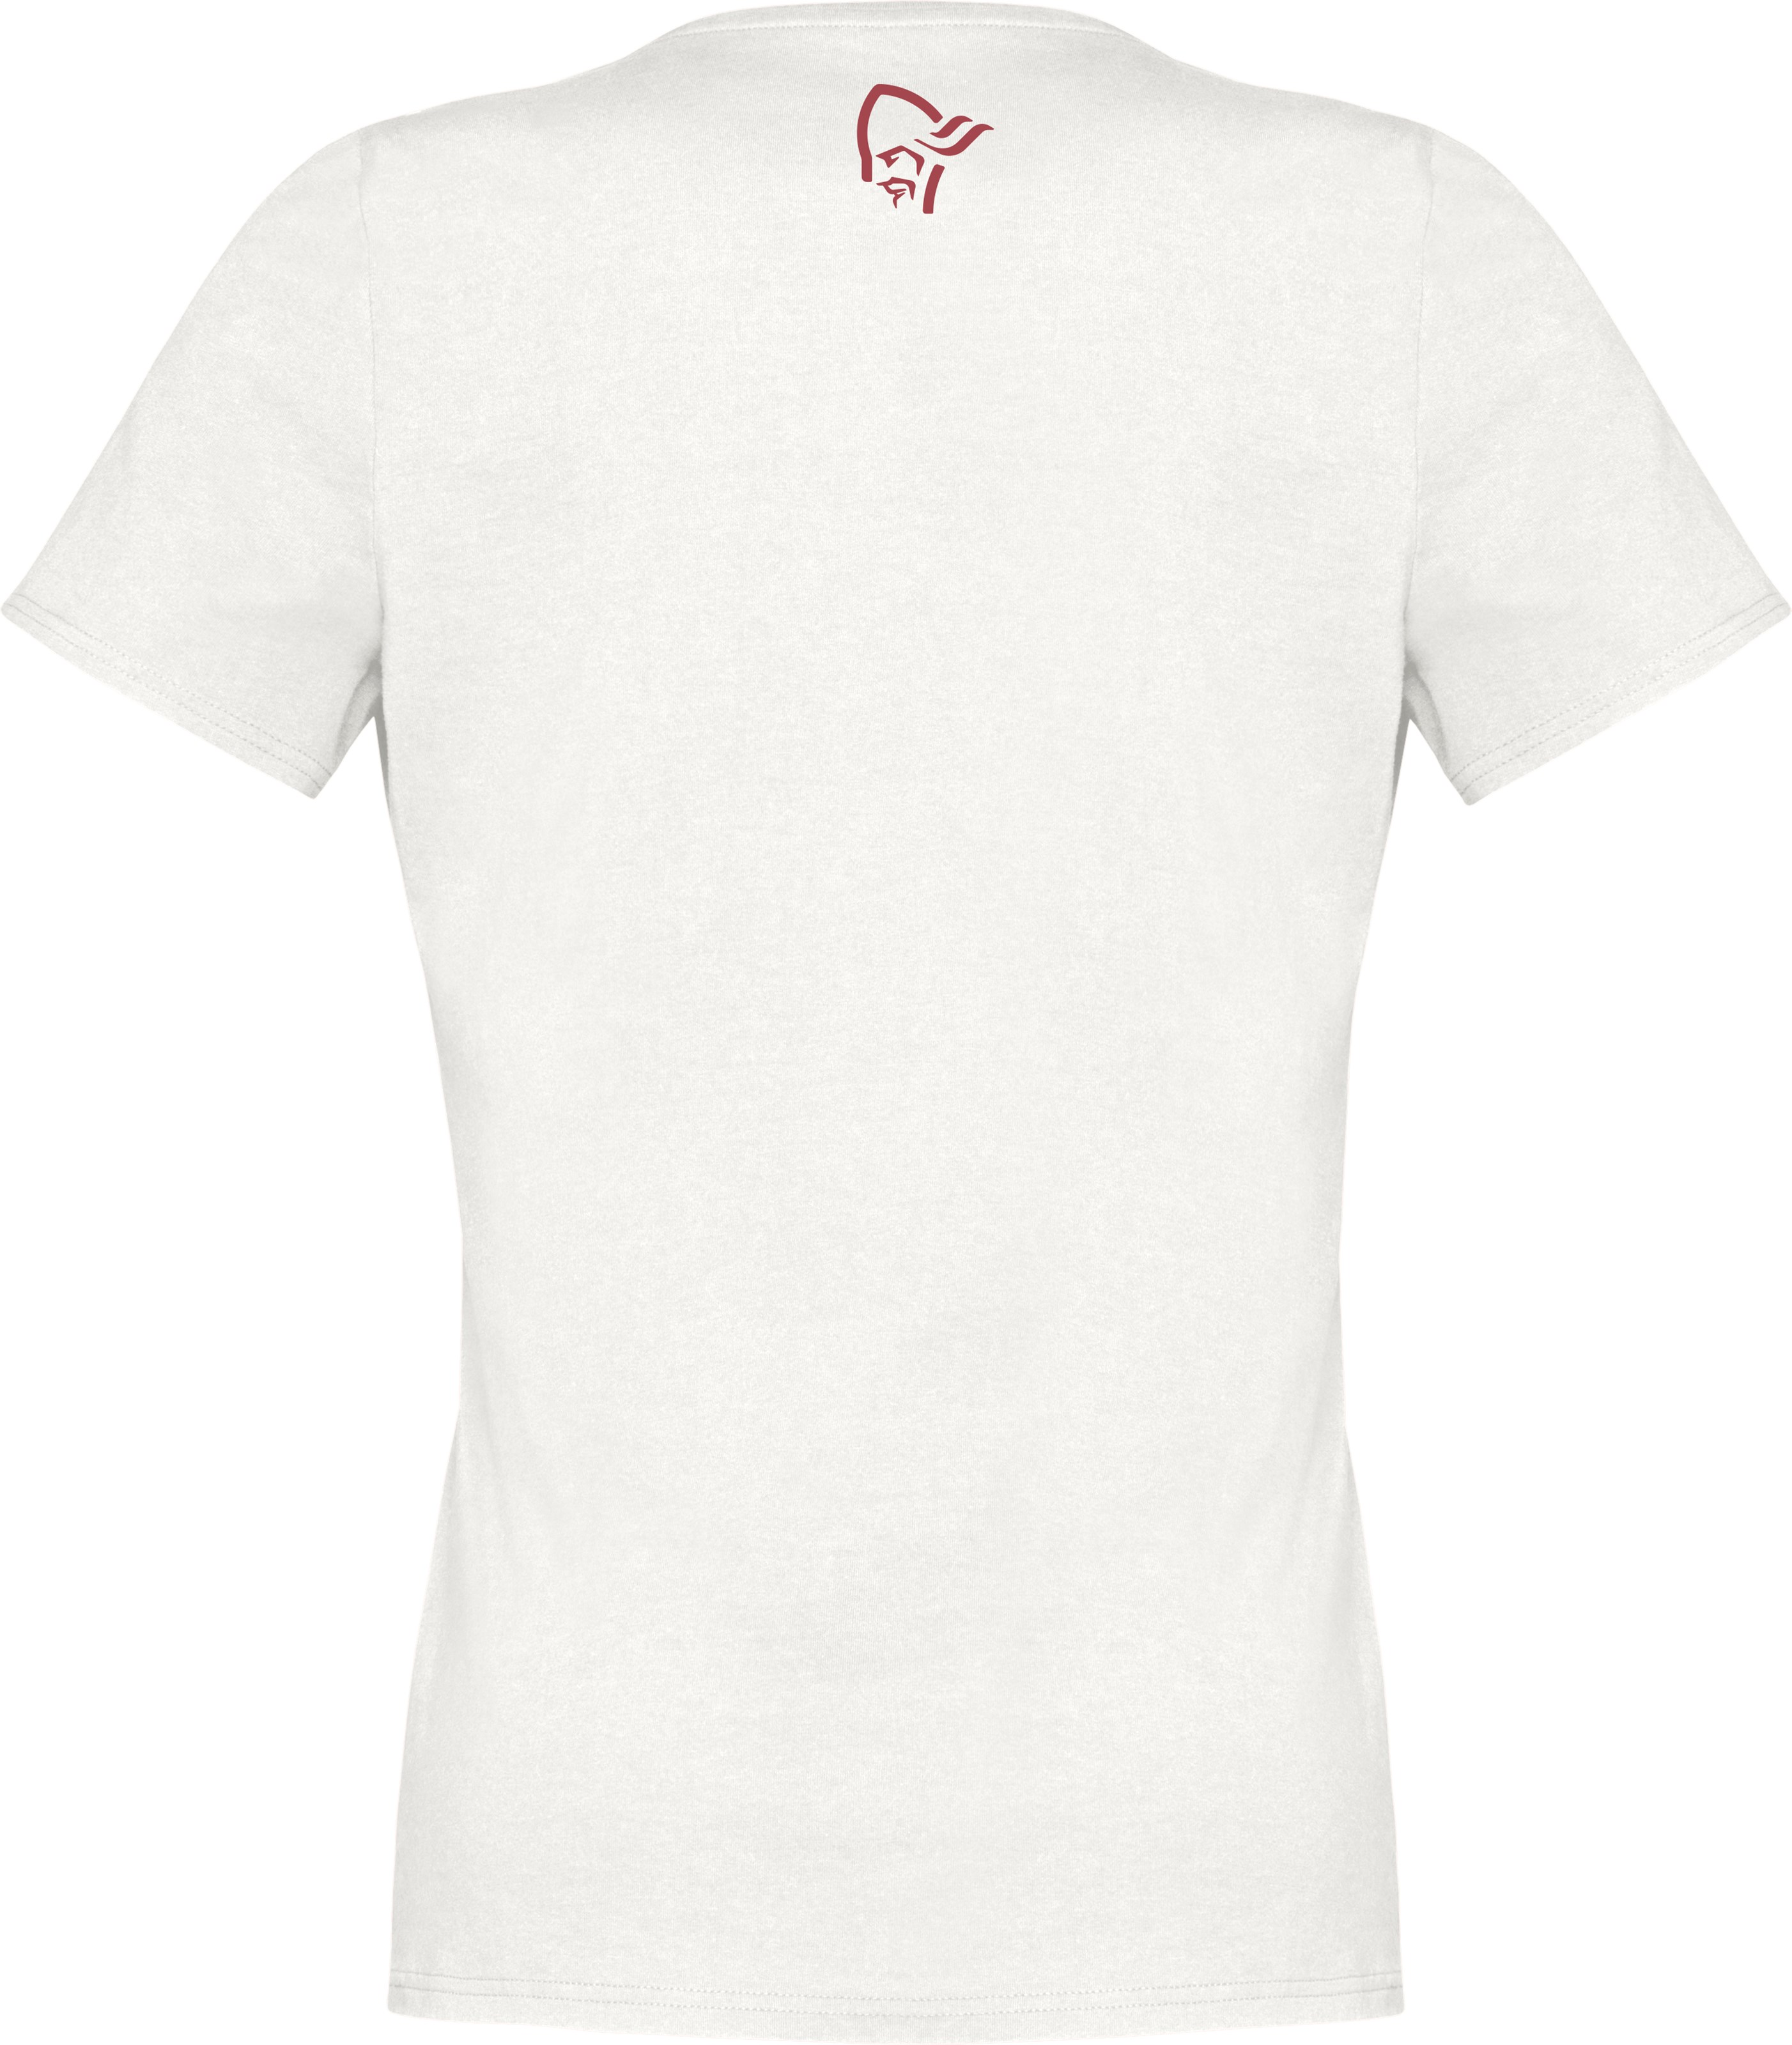 Braasport Norrøna 29 cotton legacy T shirt, t skjorte herre